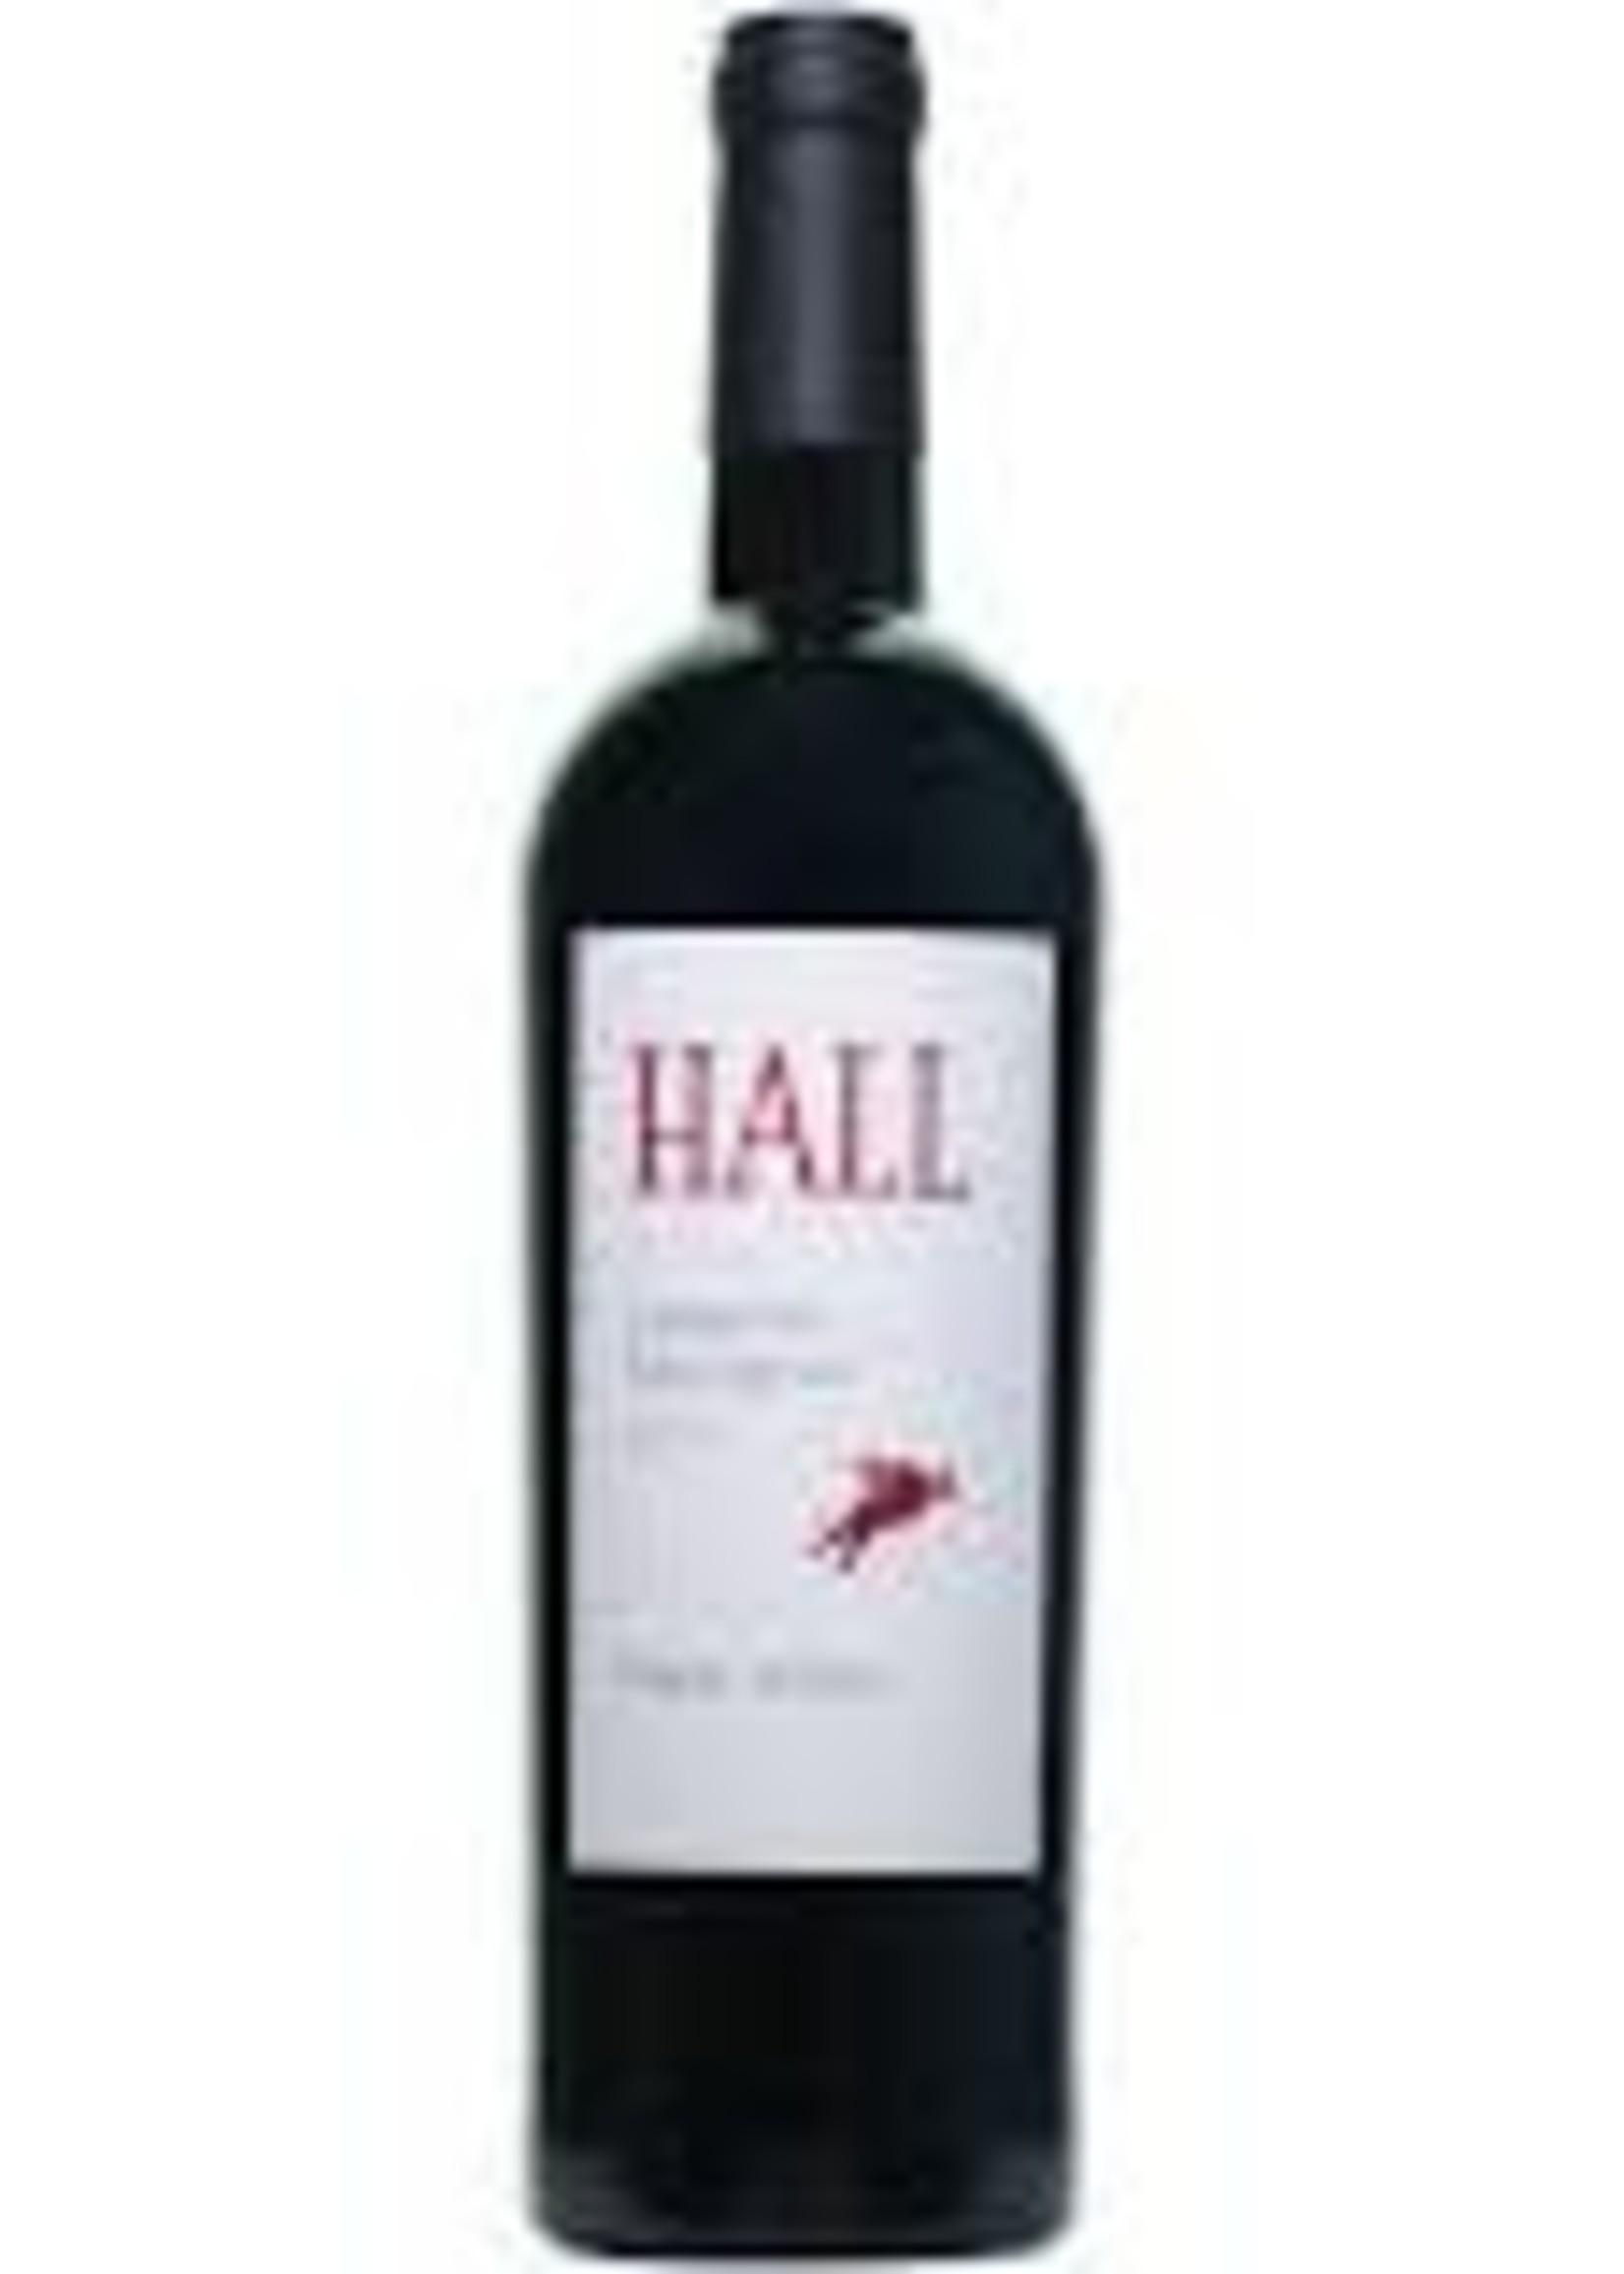 Hall Wines 2017 Cabernet Sauvignon Napa 750ml